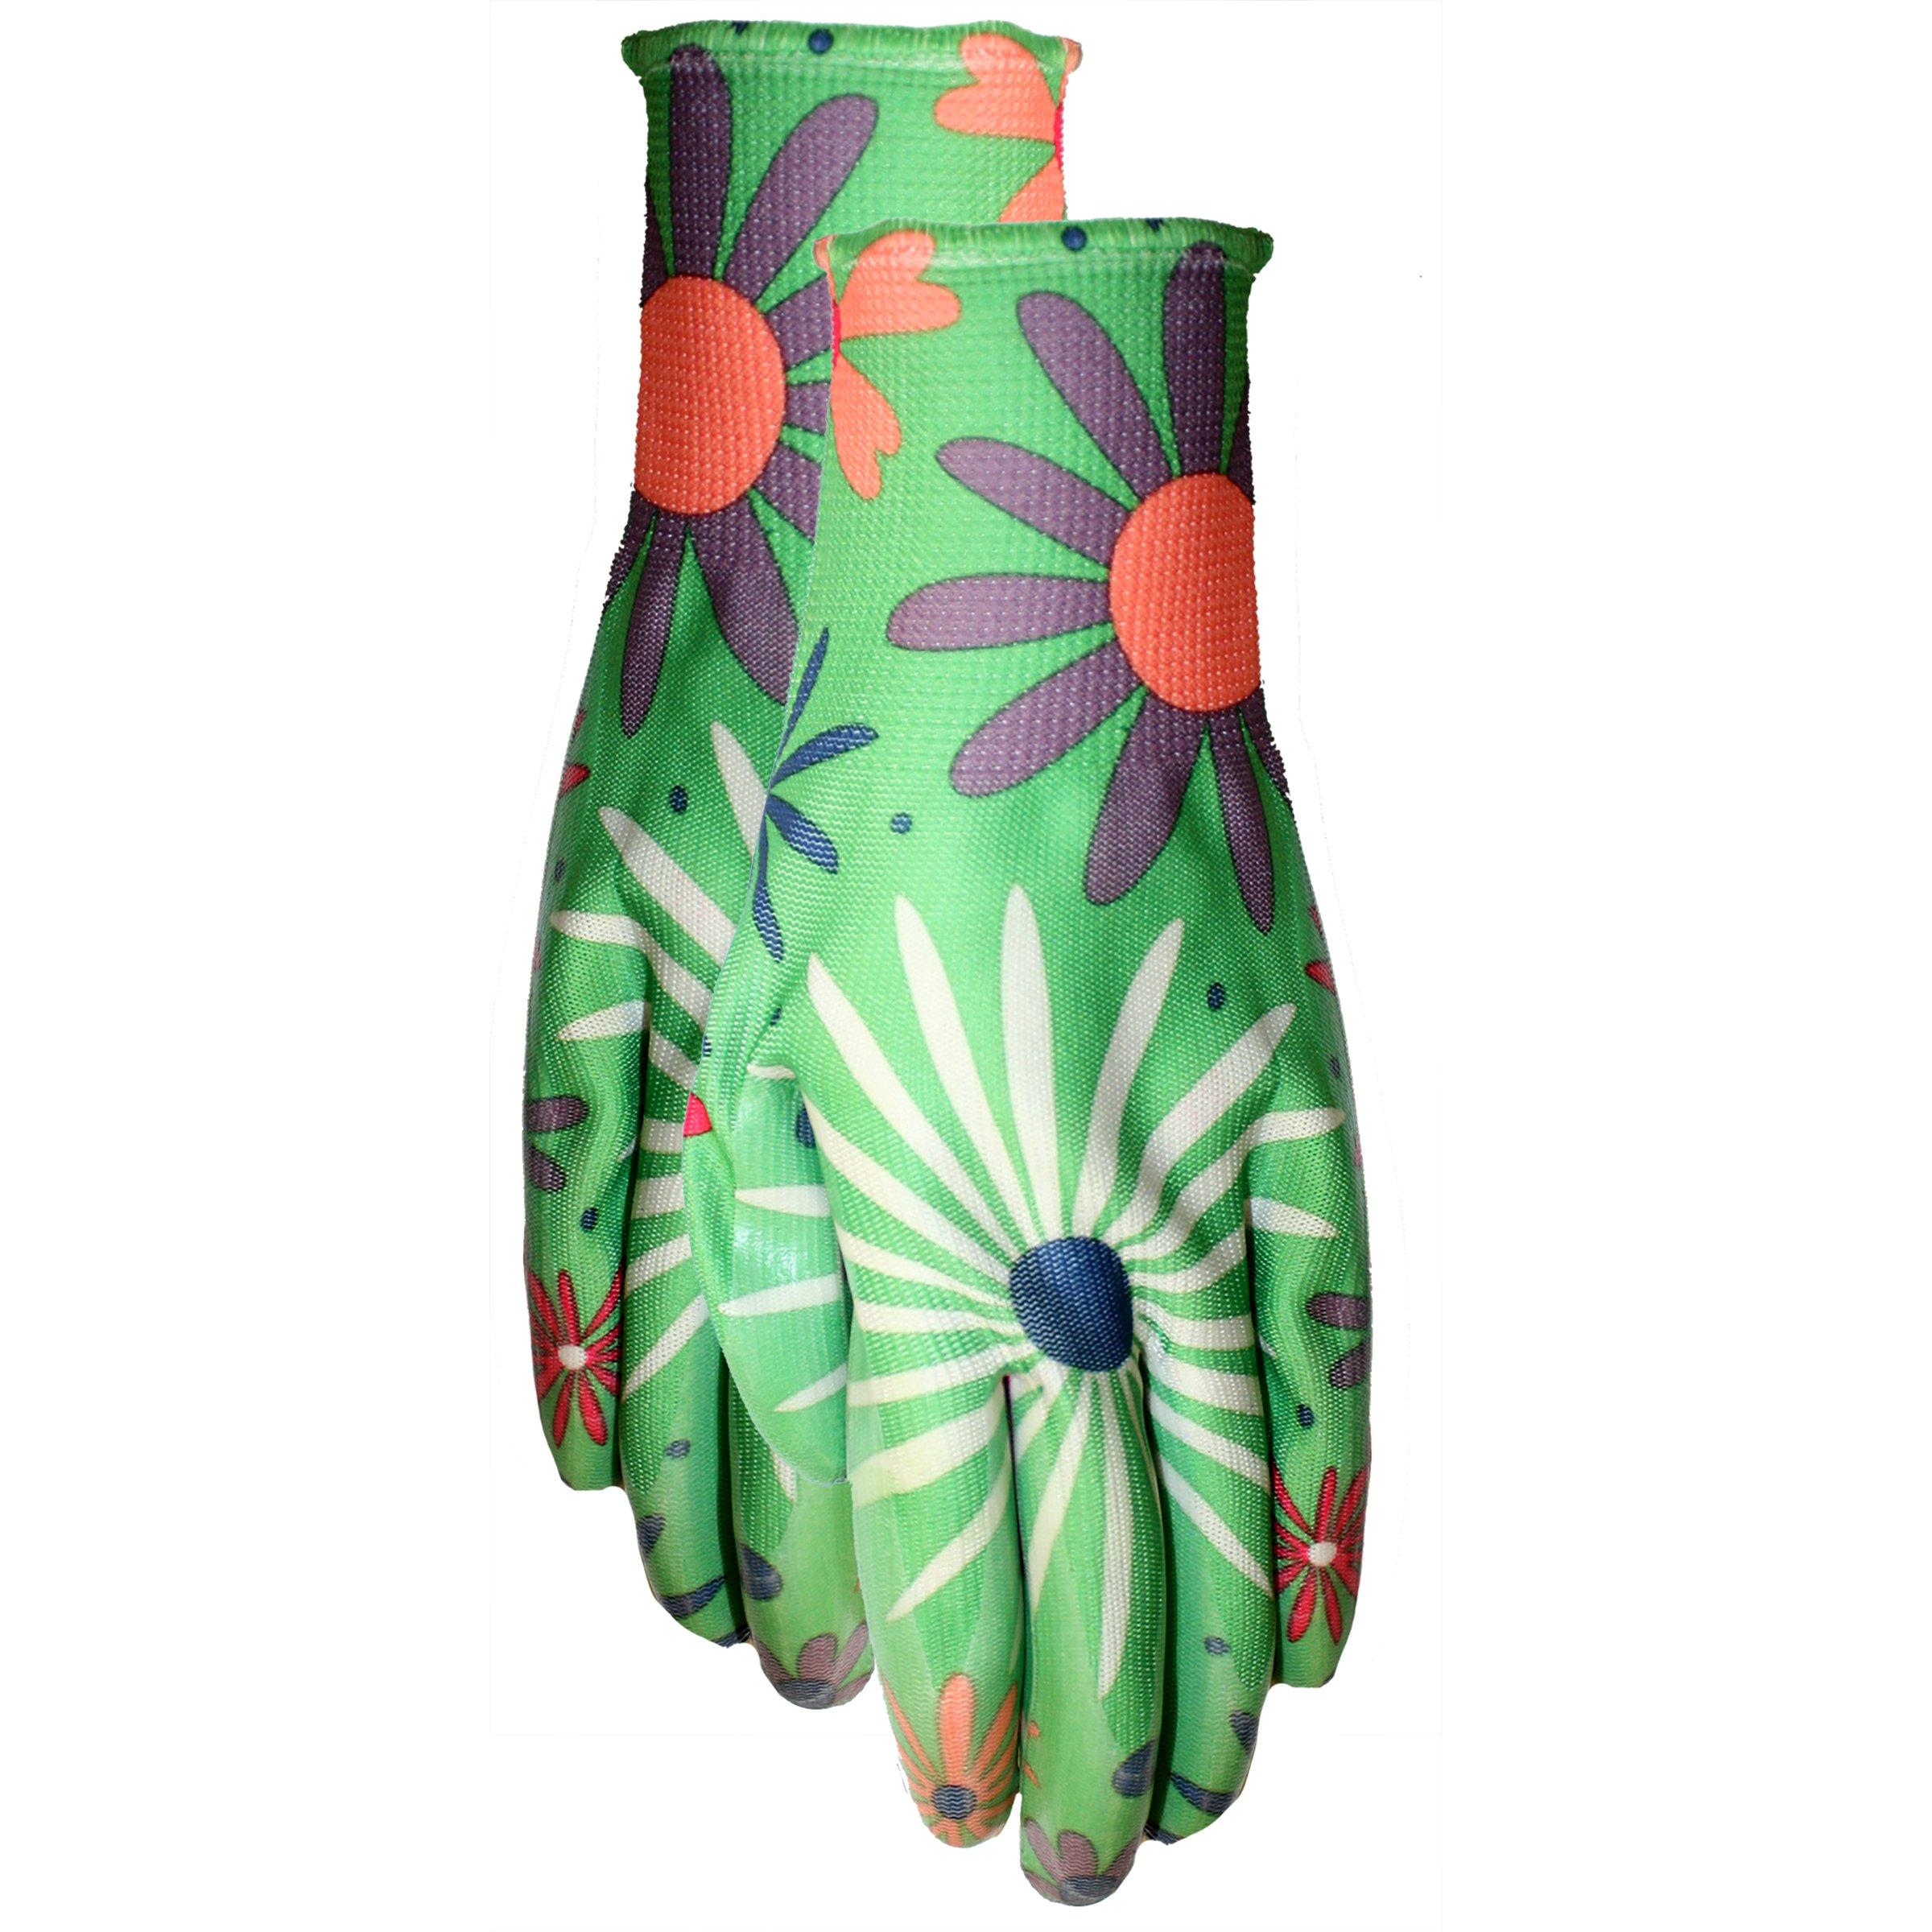 MidWest Gloves 60F6-M-AZ-1 Floral Print Poly Garden Glove, Ladies, Multicolor